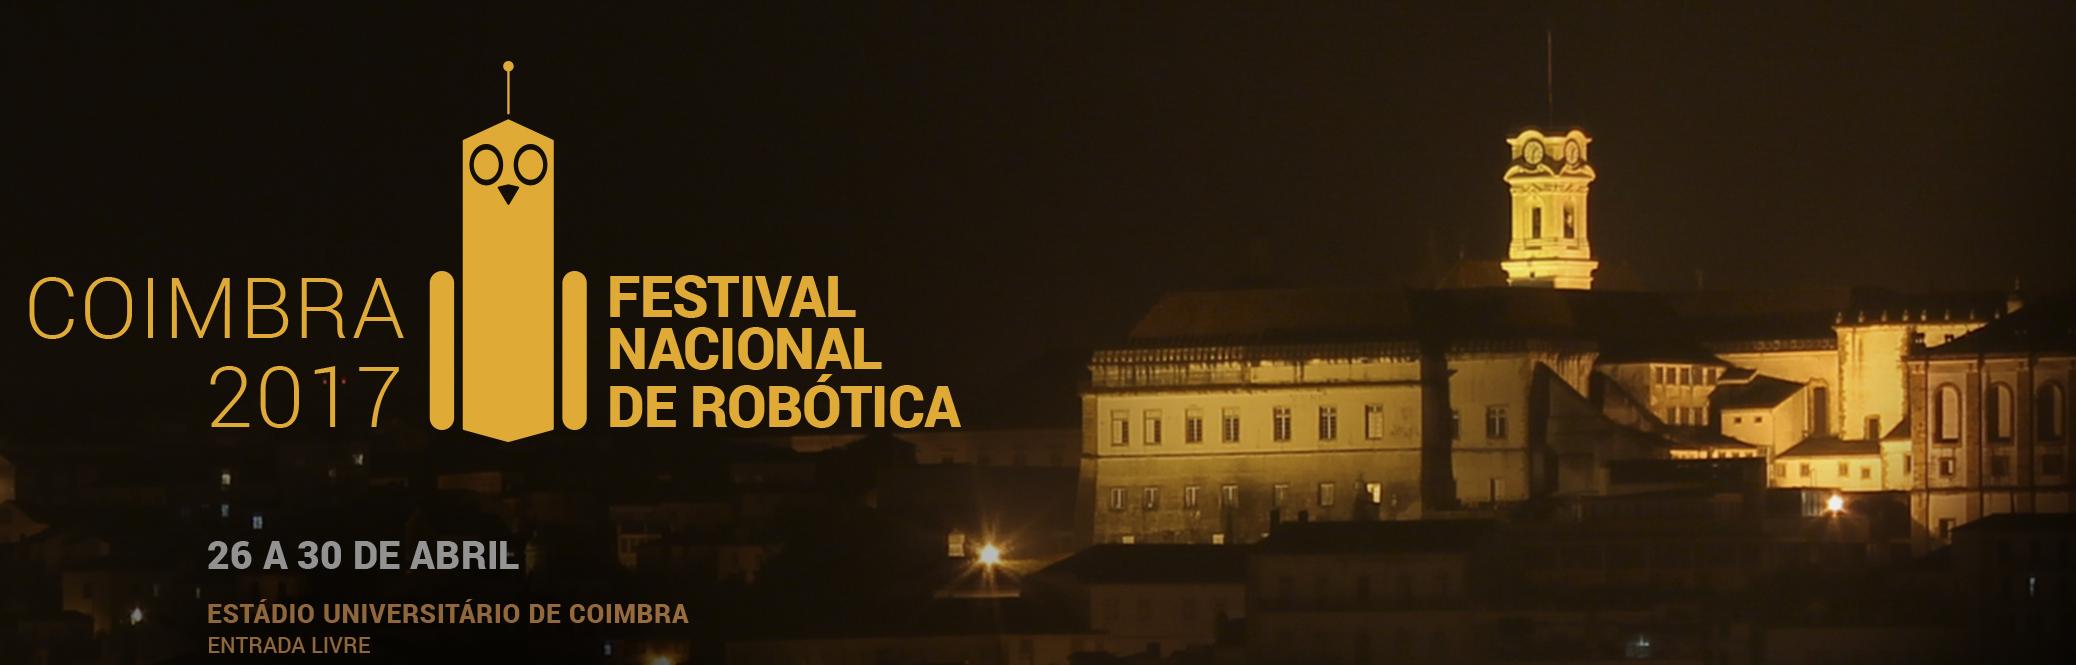 festivalrobotica